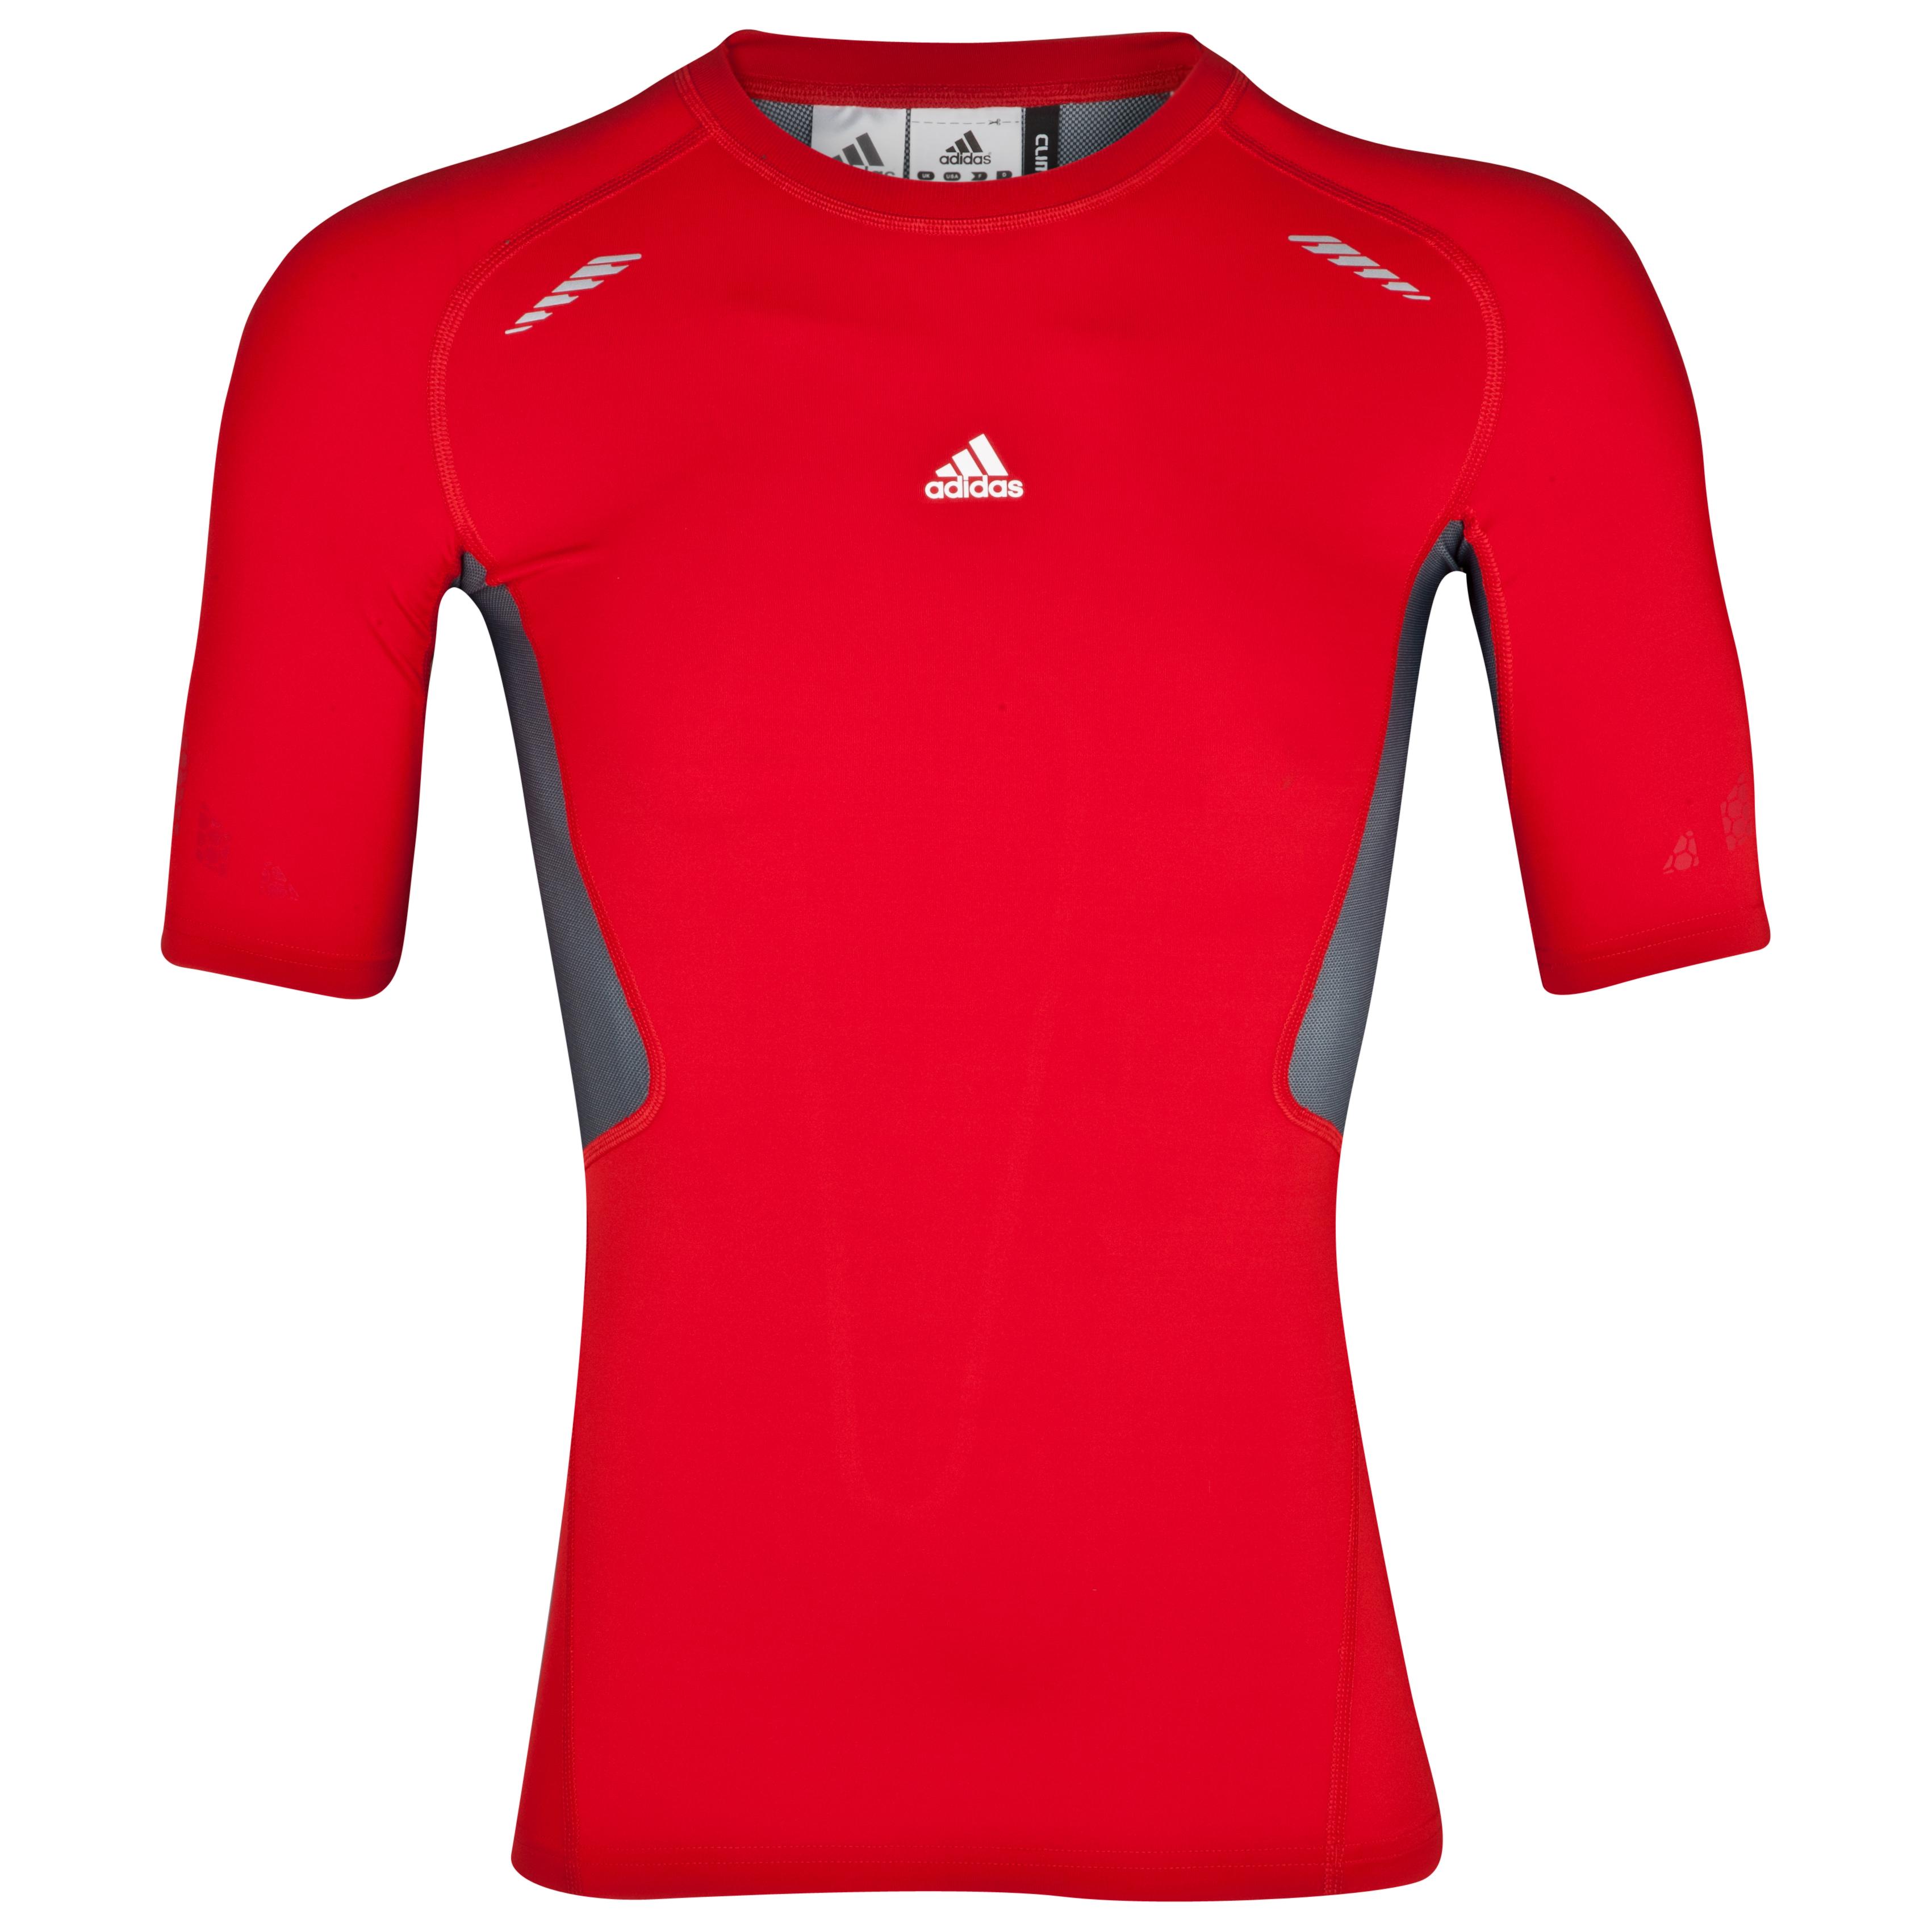 Adidas TechFit Preperation Top - Short Sleeve - Light Scarlet